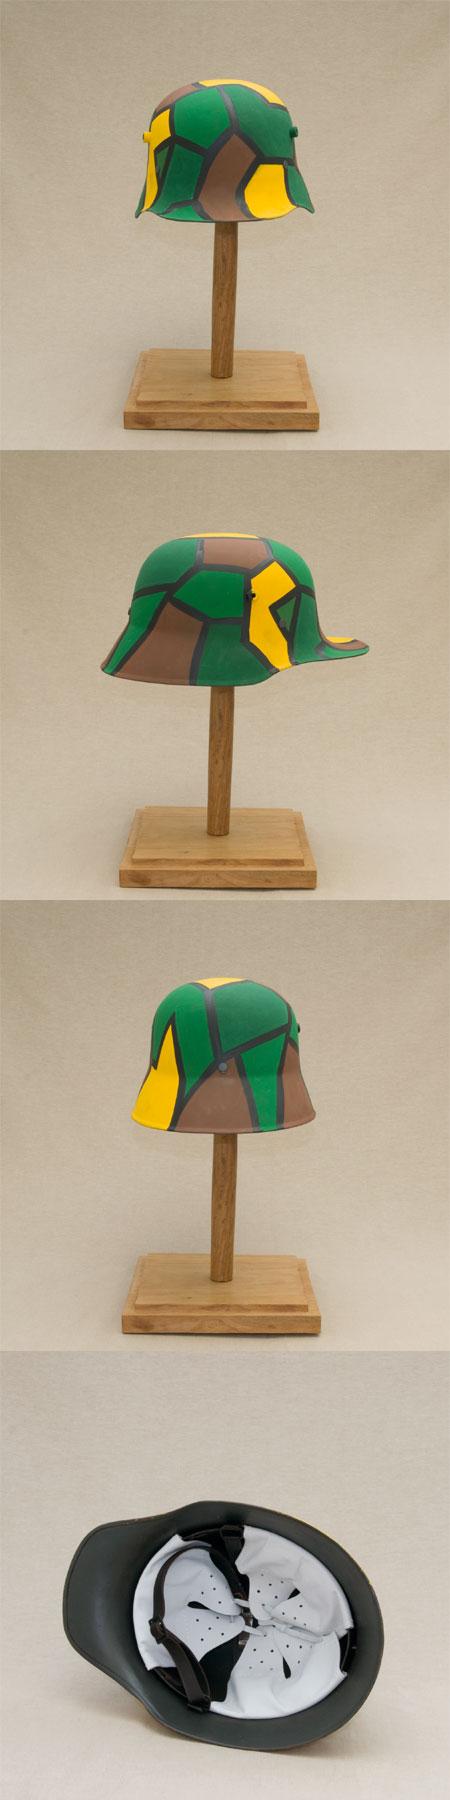 German M18 helmet, WW1, best quality reproduction